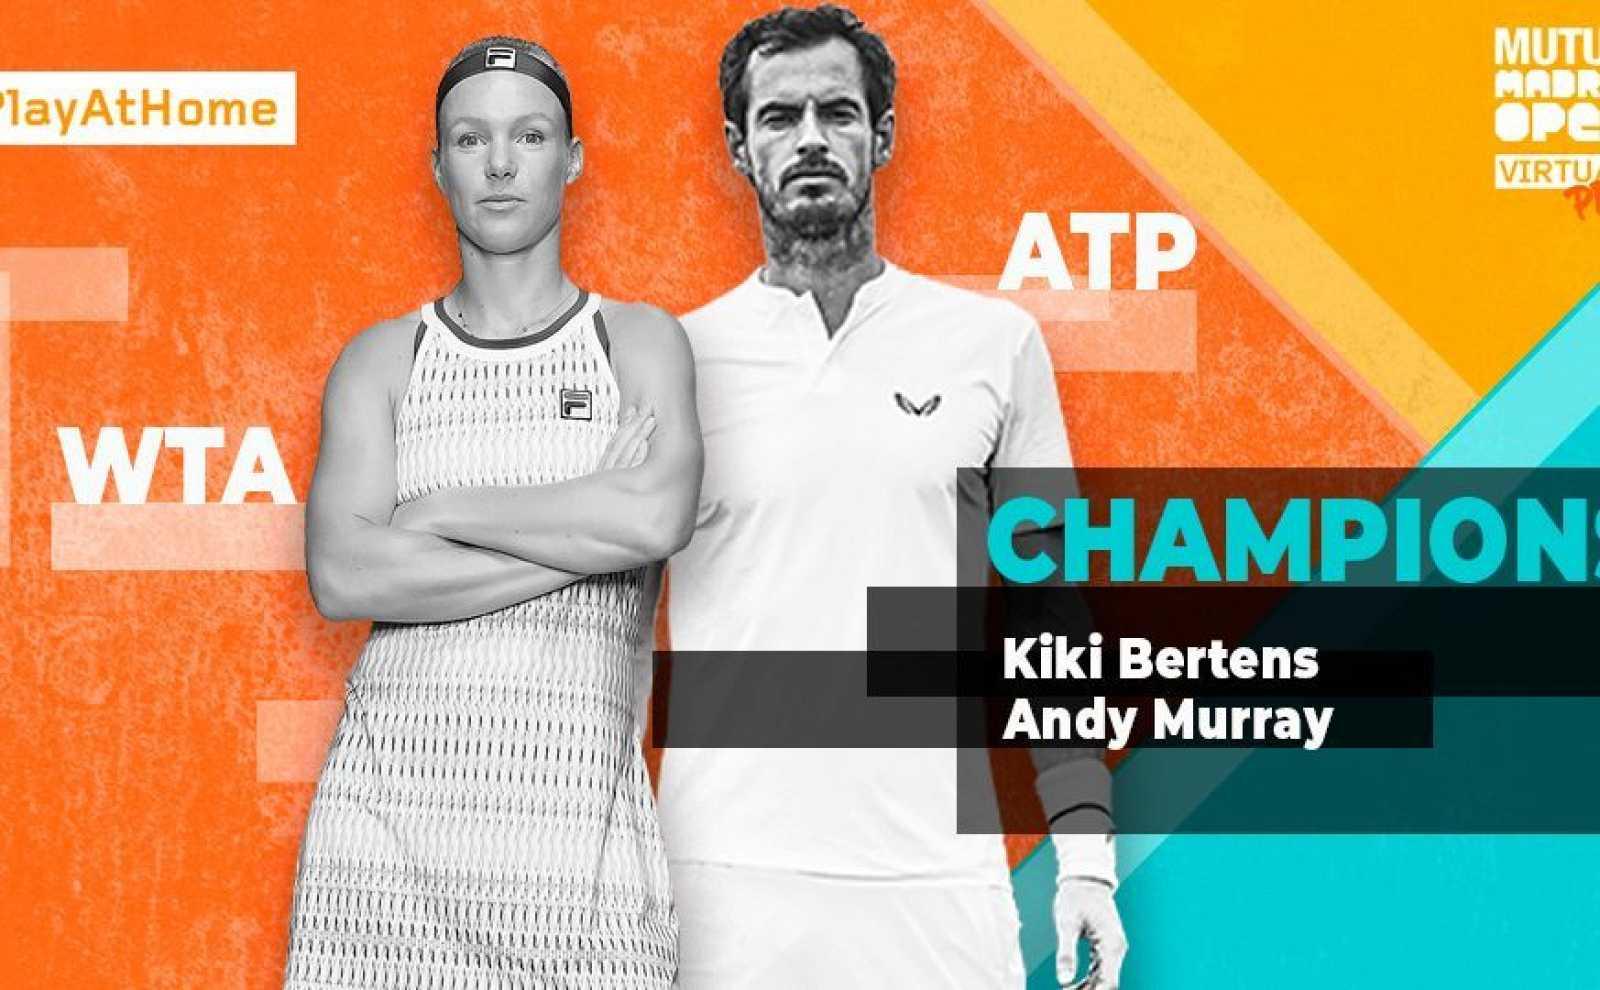 Imagen d elos dos vencedores del Mutua Madrid Open Virtual Pro: Andy Murray y Kiki Bertens.